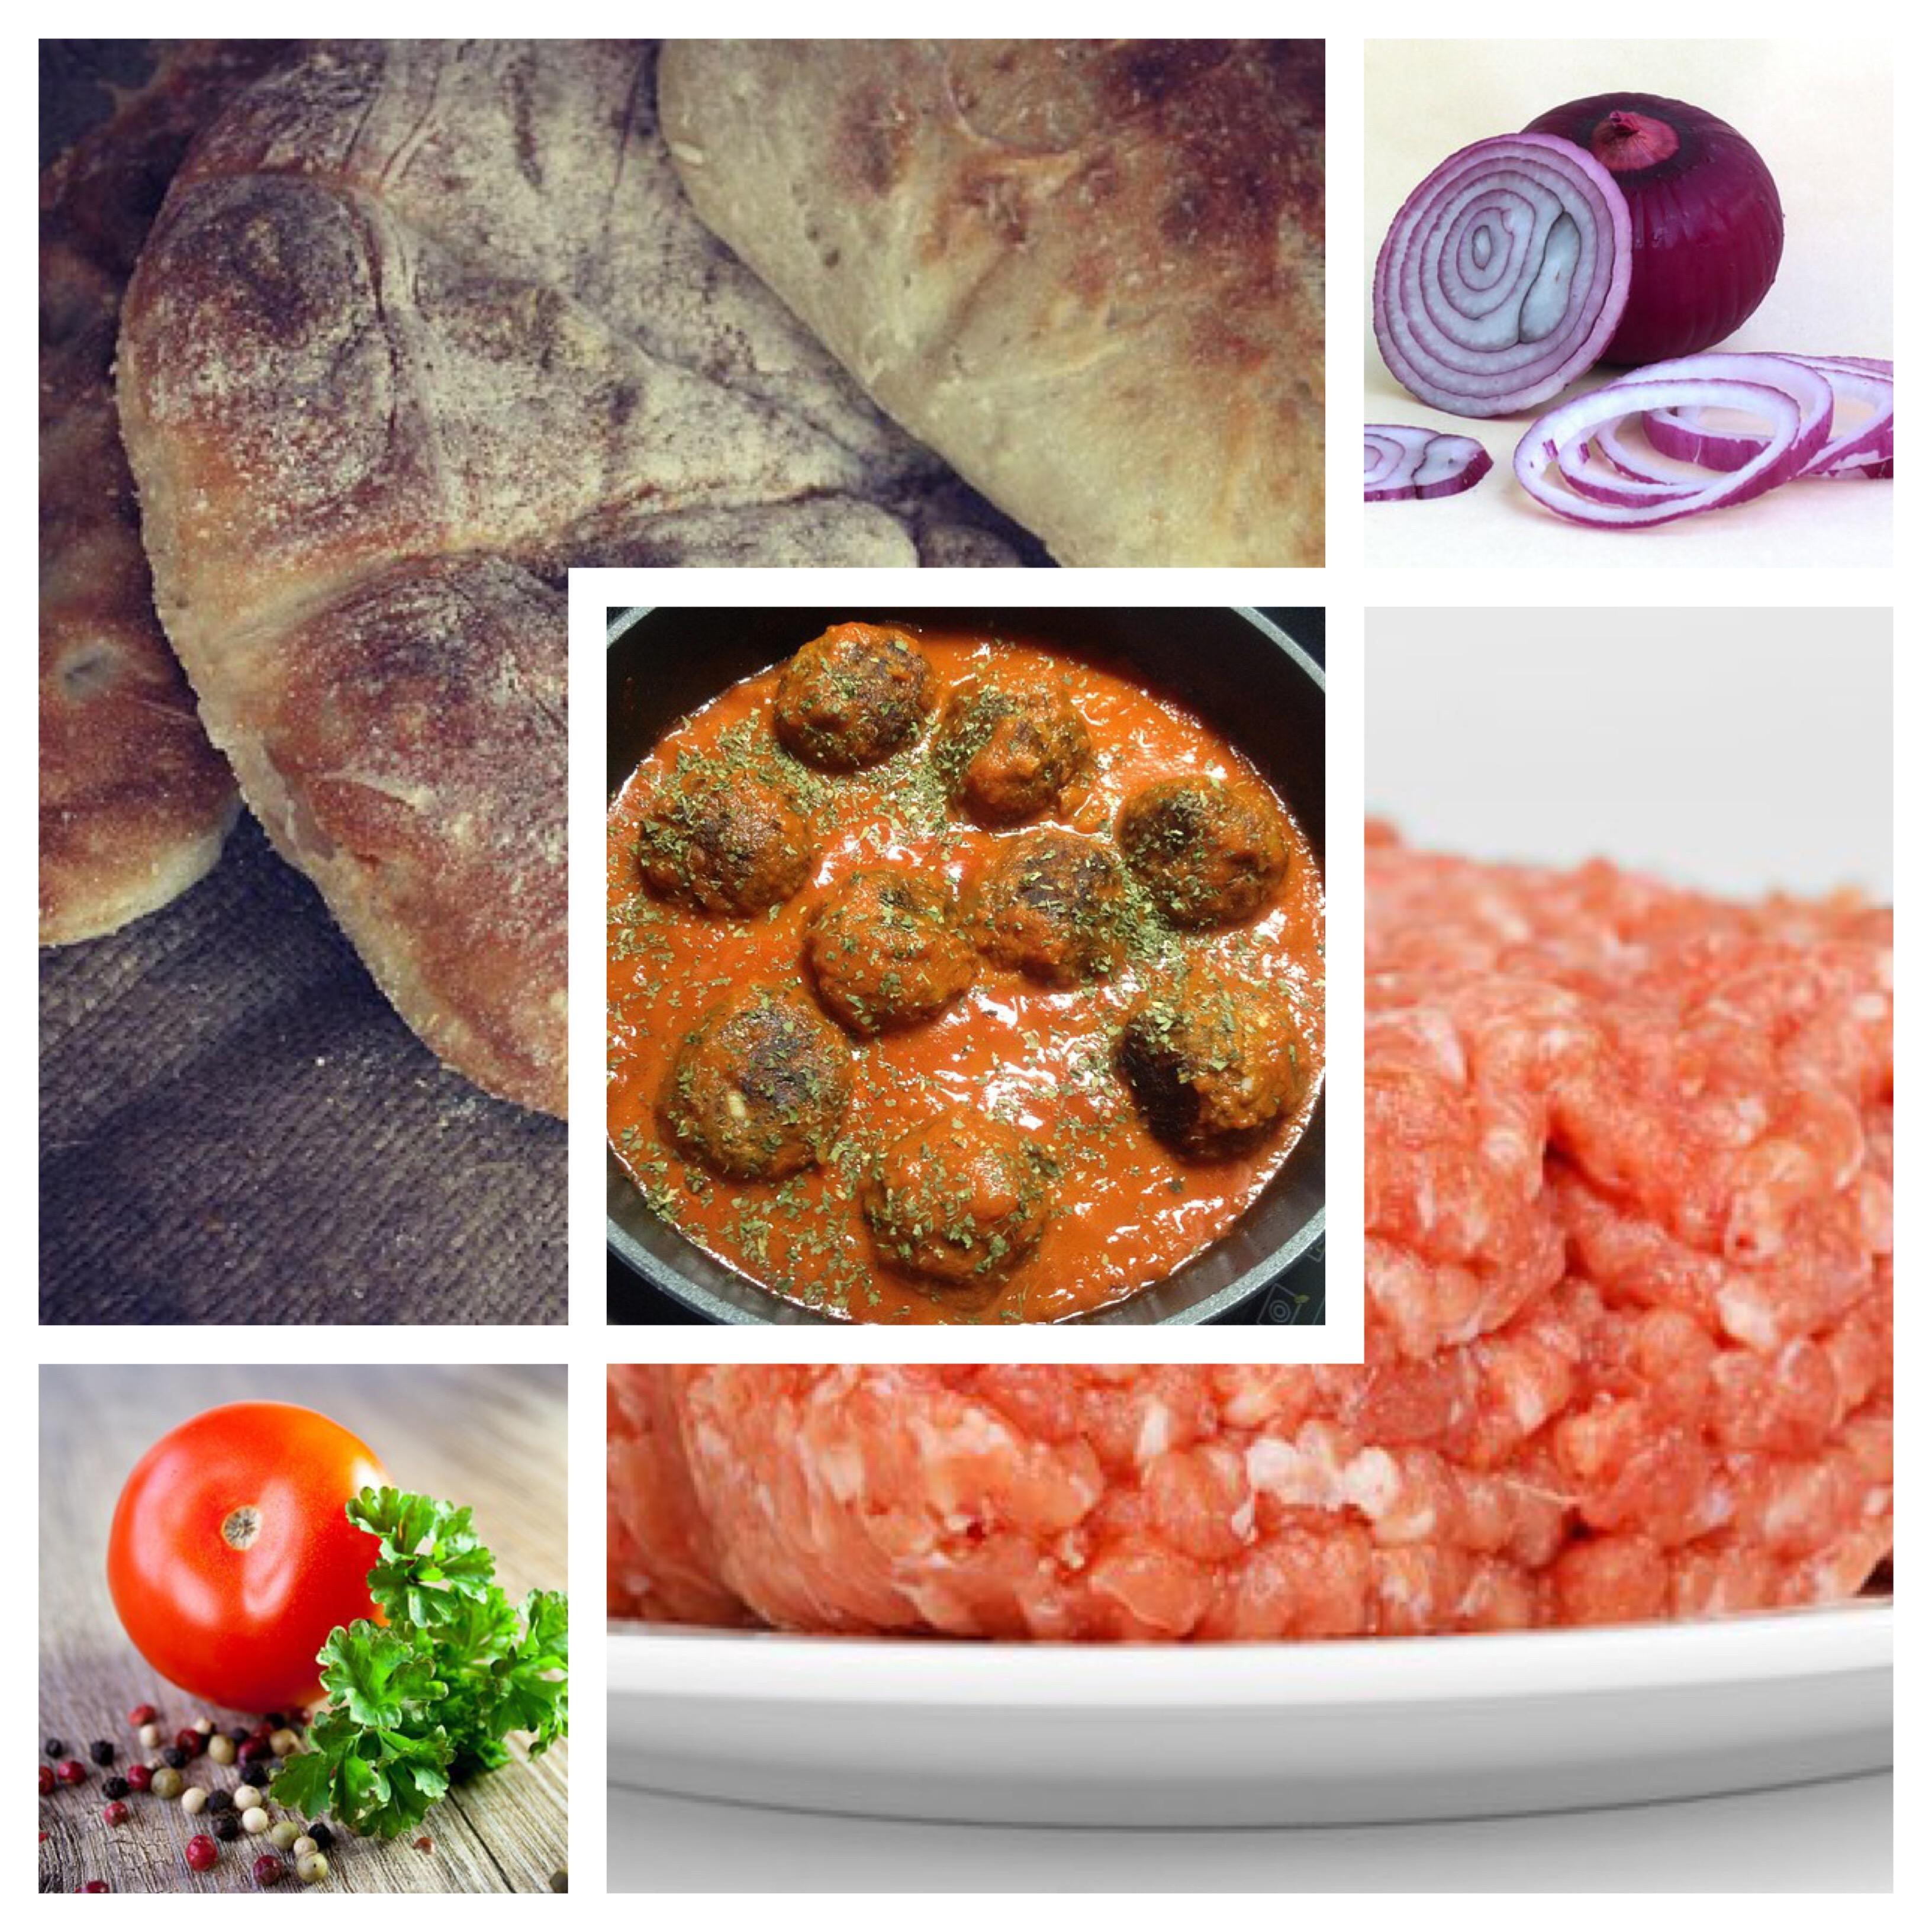 Mexicaanse gehaktballetjes met Turks brood